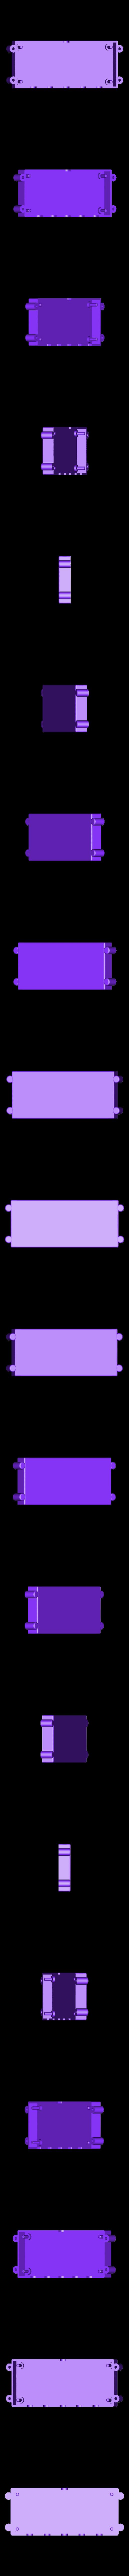 MV_AMC_Lower_Case.stl Download free STL file Case for myVolts passive mixer • 3D printable template, PapaBravo